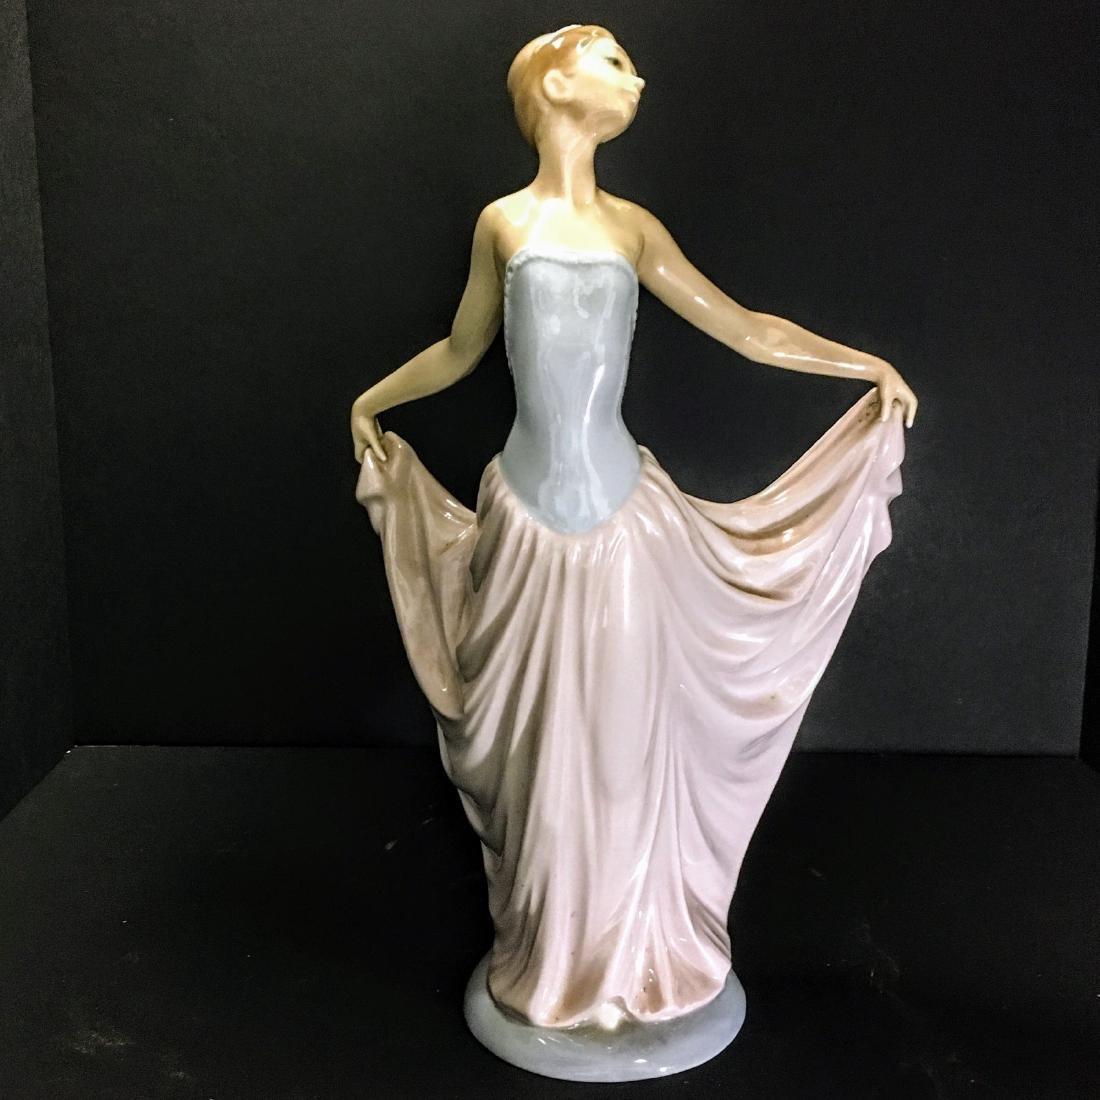 Lladro Figurine #5050 - The Dancer